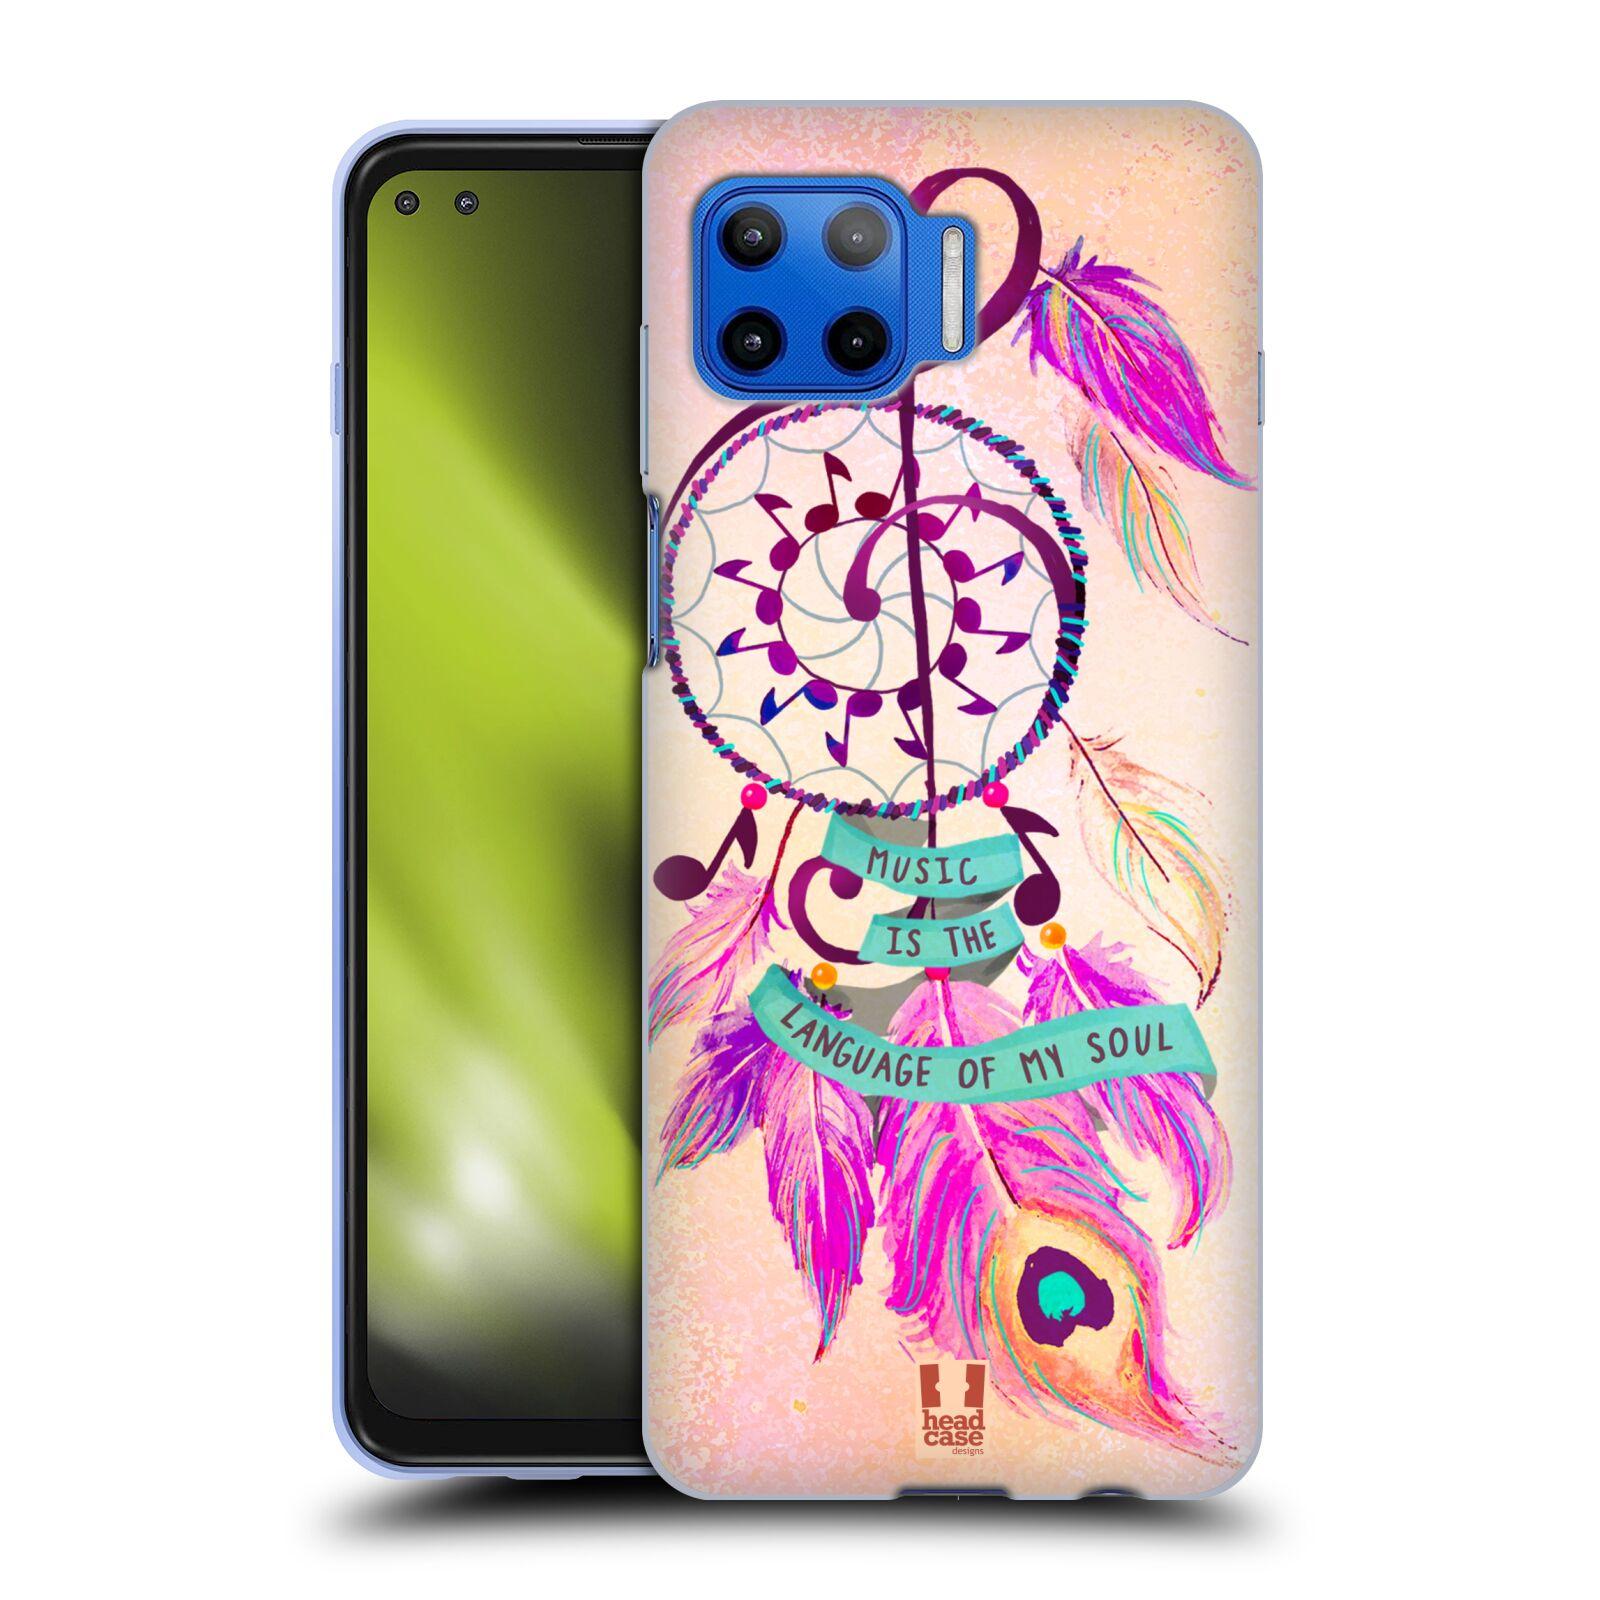 Silikonové pouzdro na mobil Motorola Moto G 5G Plus - Head Case - Lapač Assorted Music